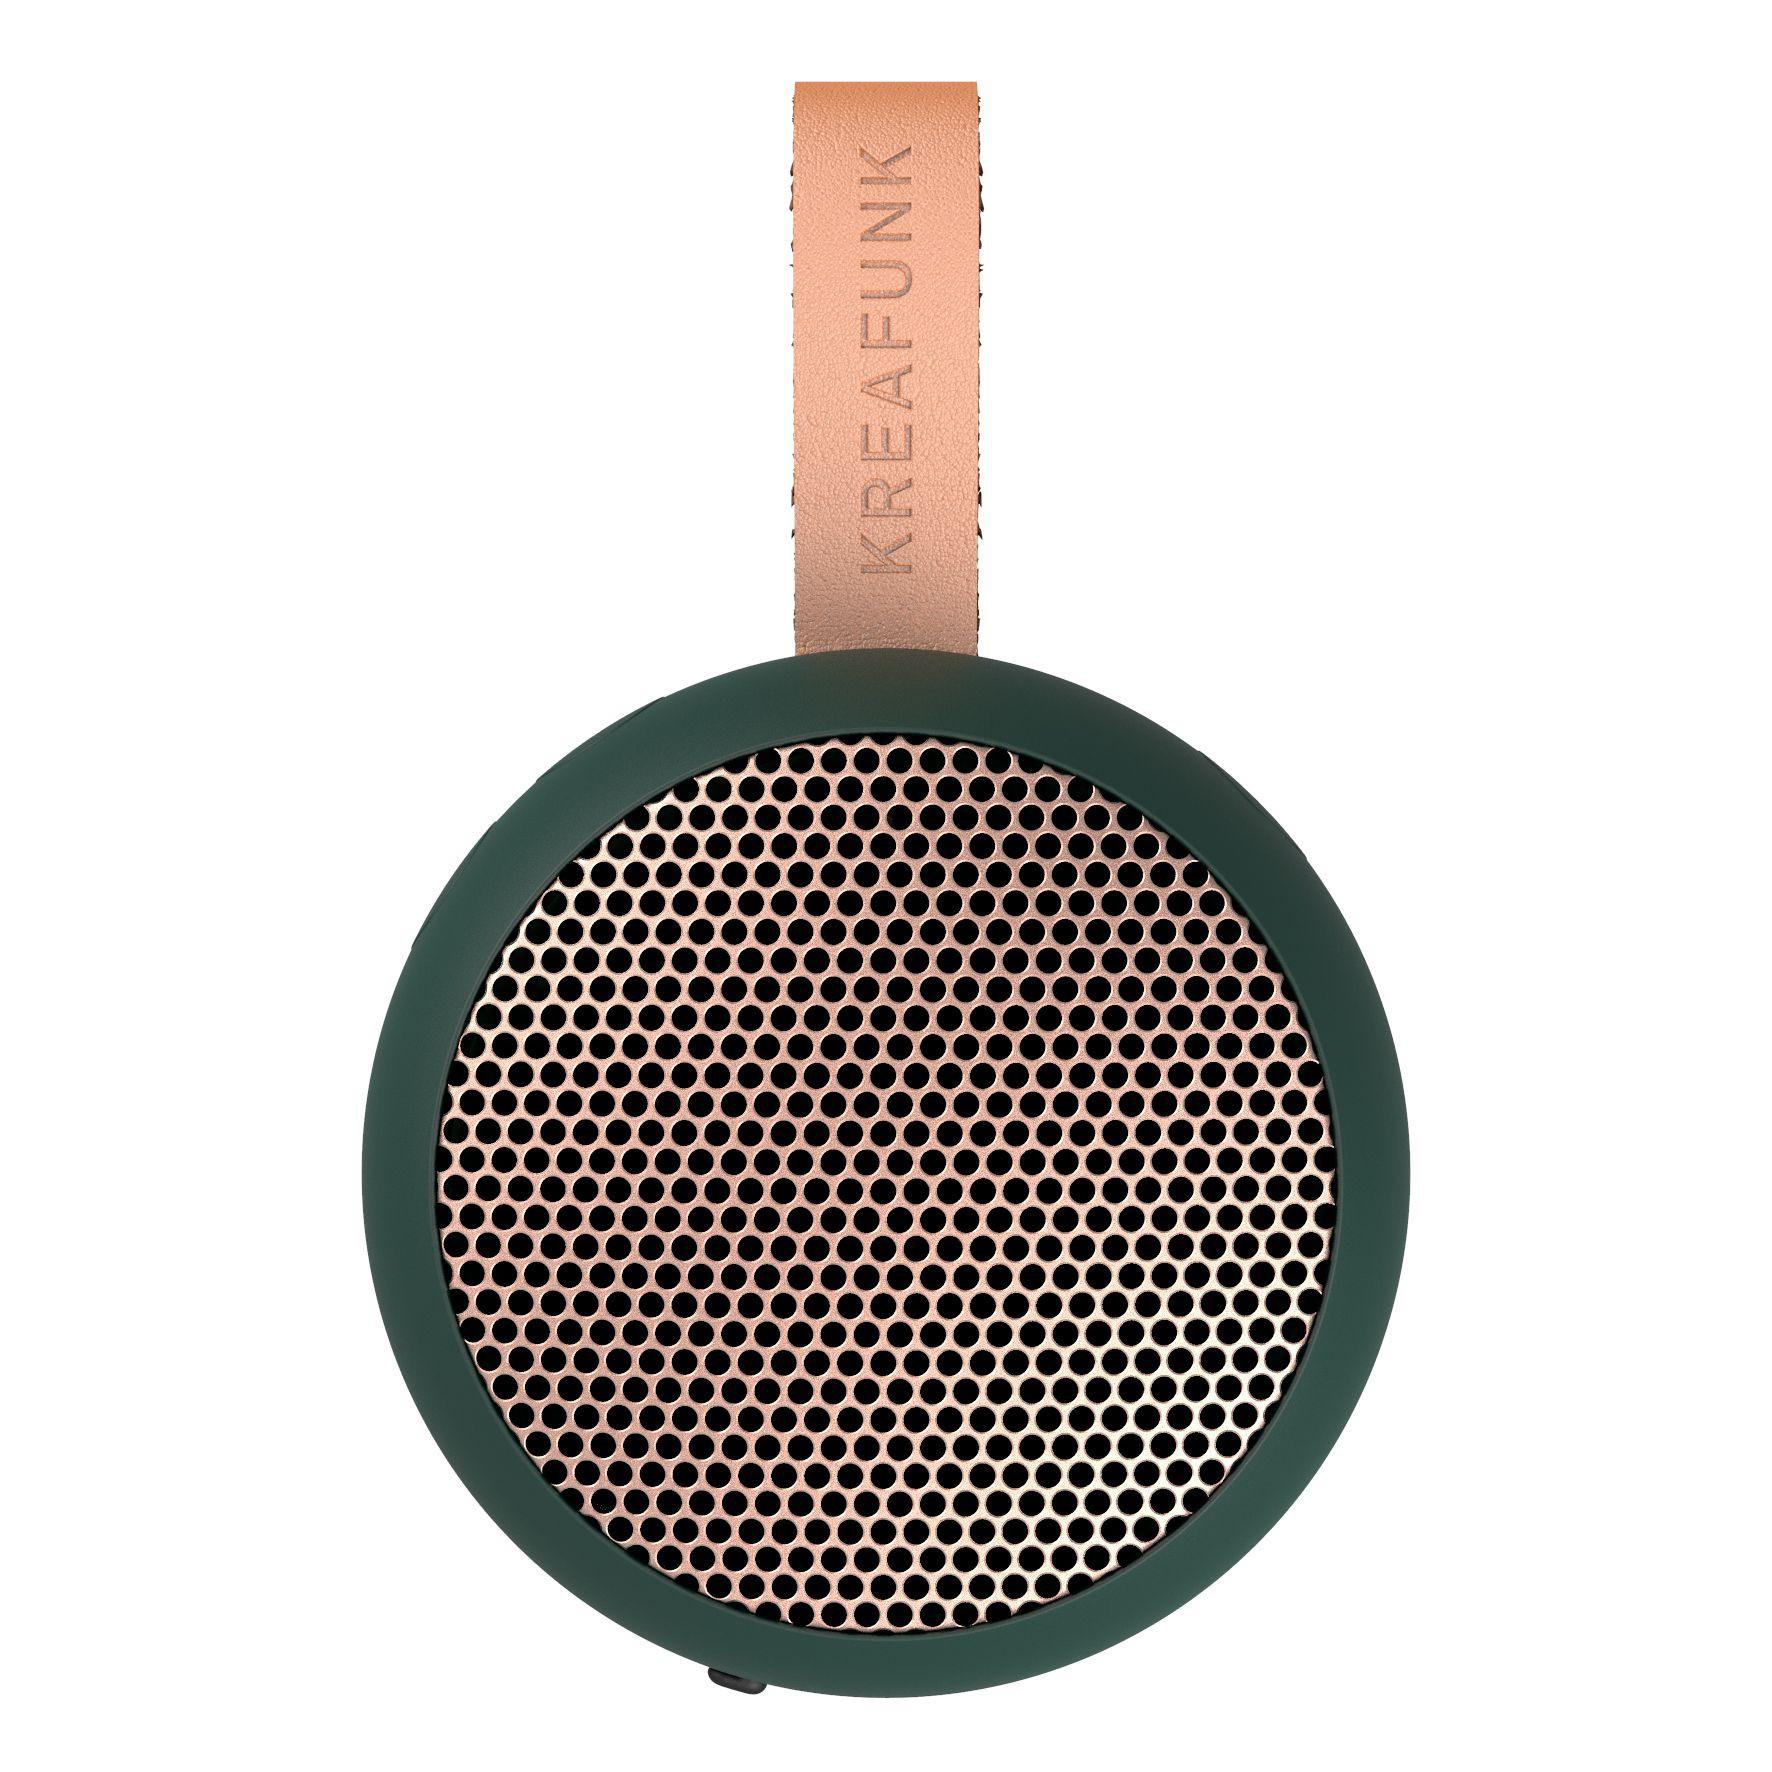 AGO altoparlante bluetooth splashproof con vivavoce - verde